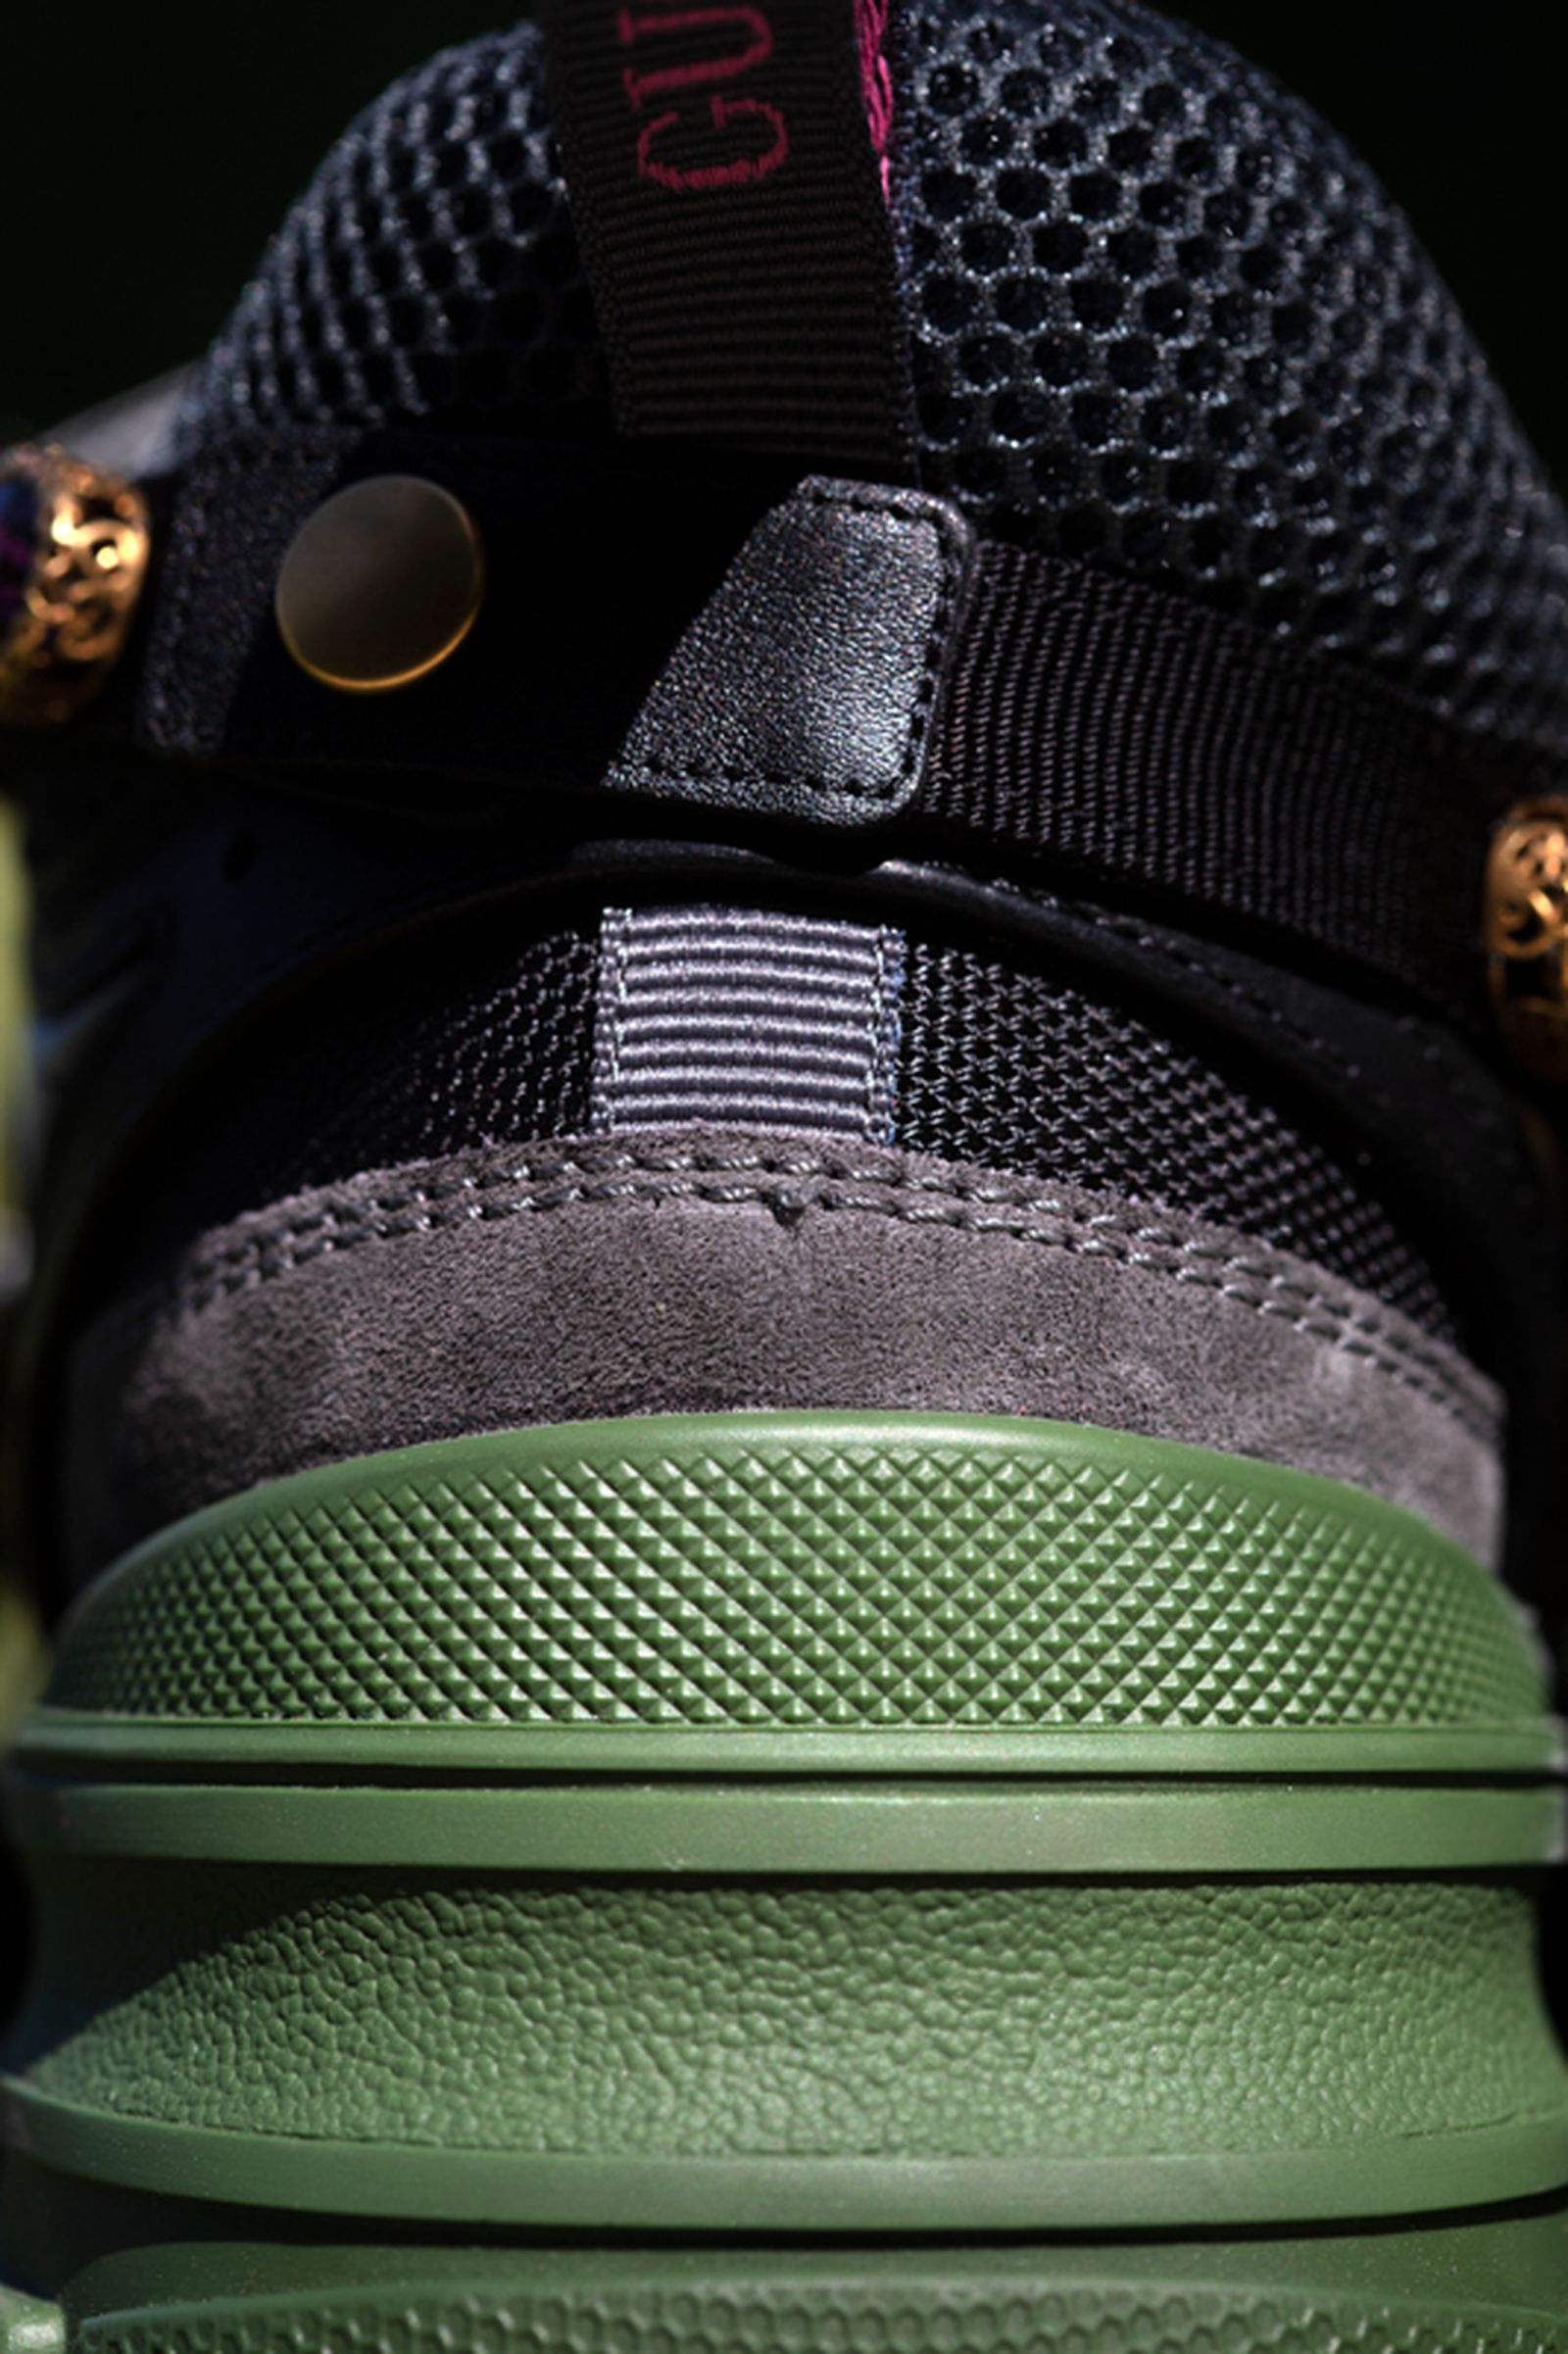 gucci-sega-crystal-sneaker-release-price-7